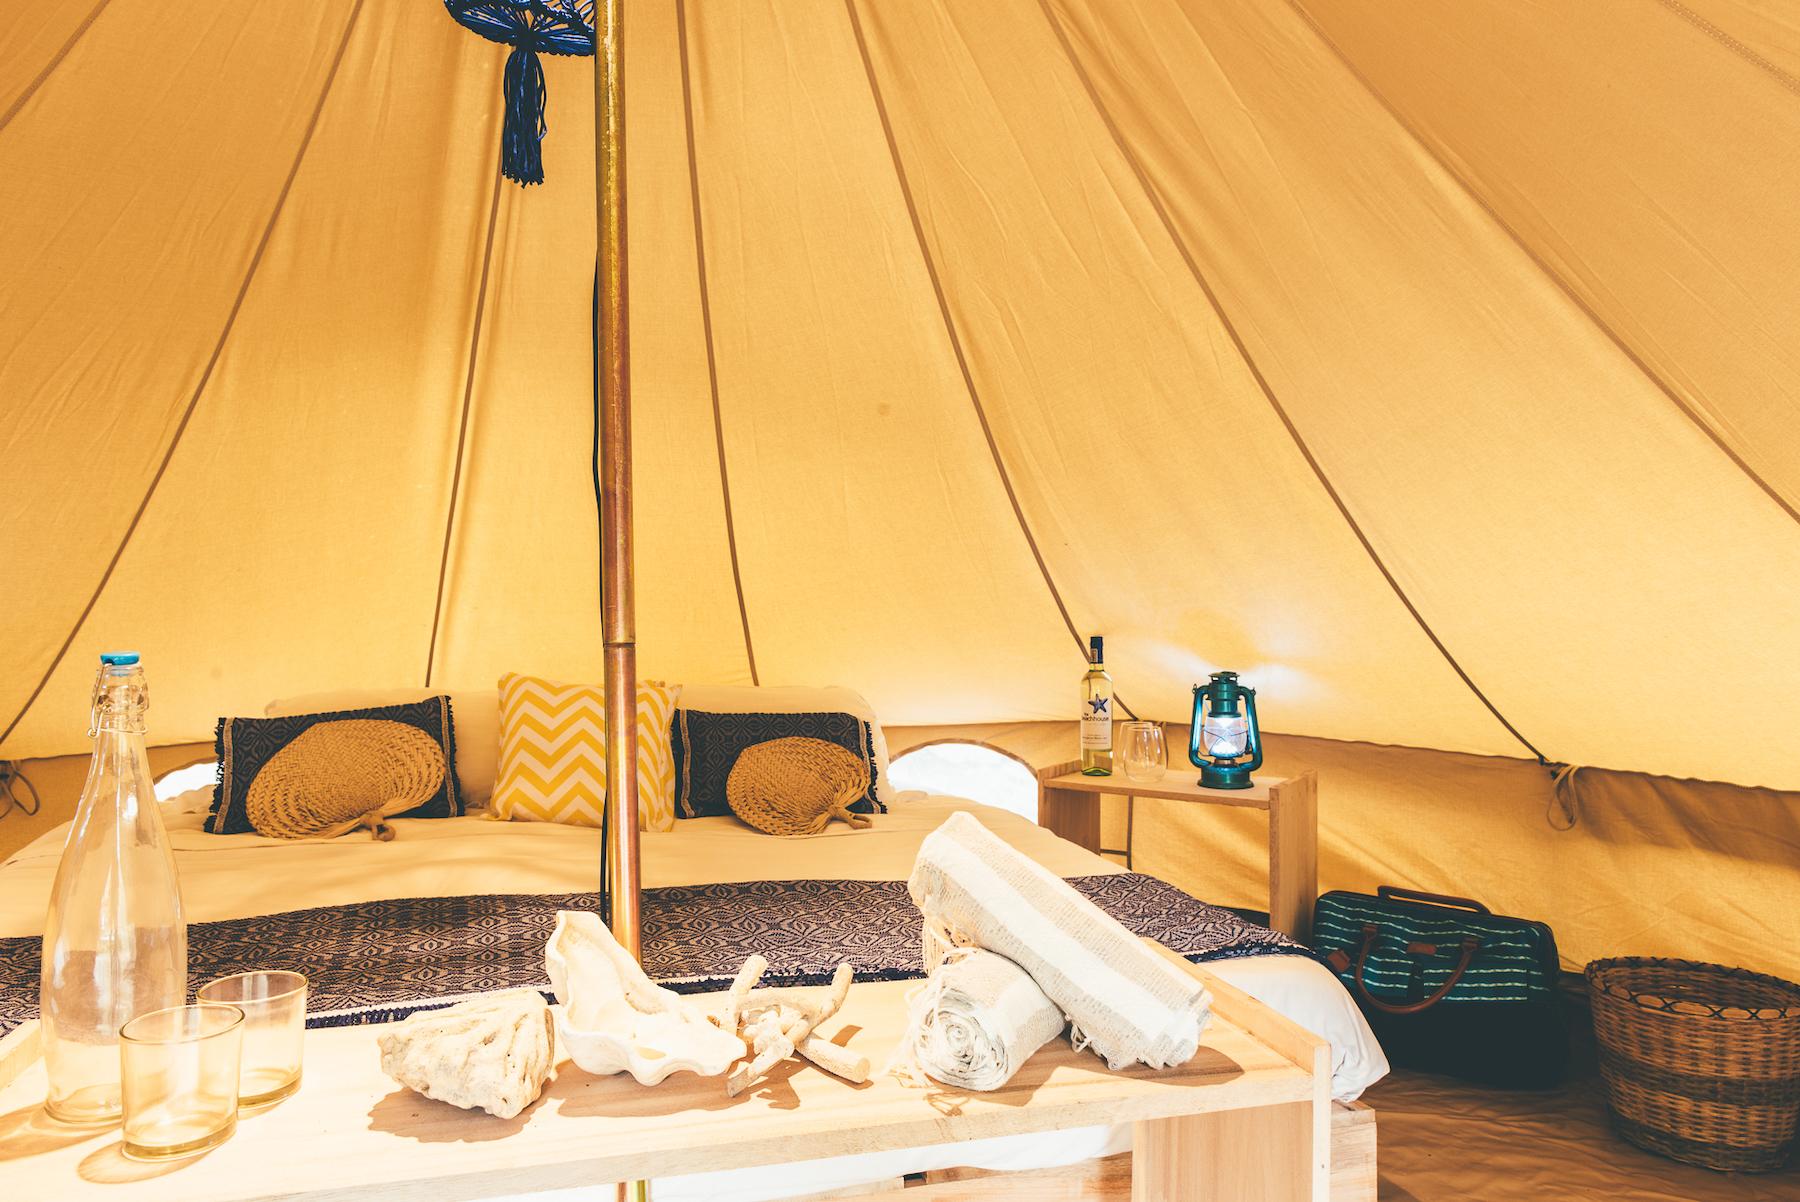 yoga-retreat-siargoa-island-soul-tribe-glamping-tent.jpg